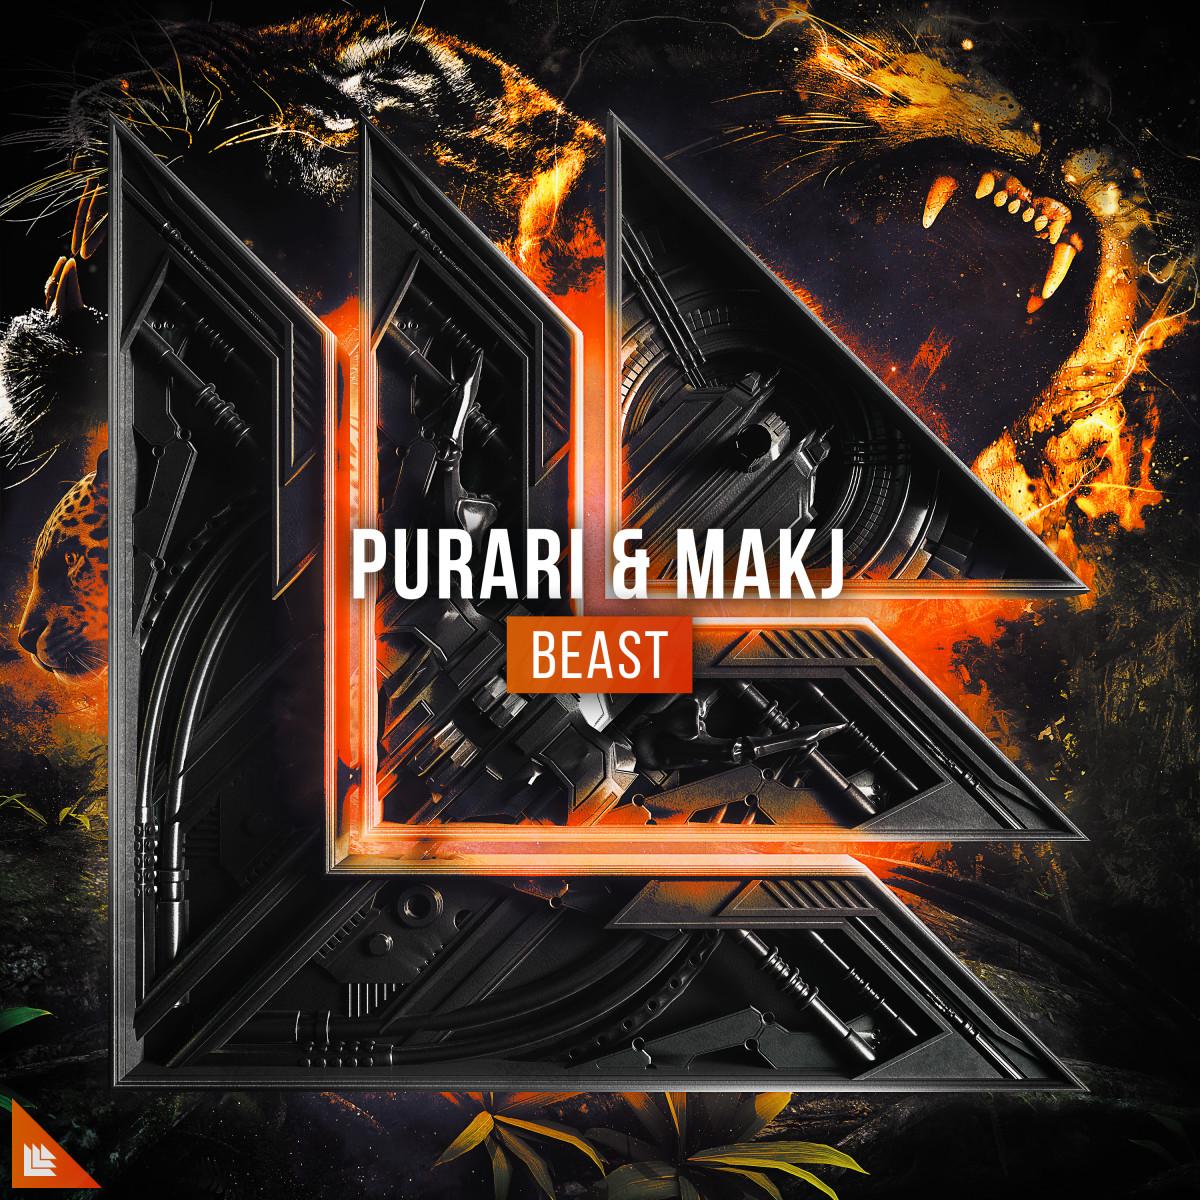 Purari & MAKJ - Beast (ALBUM ART)